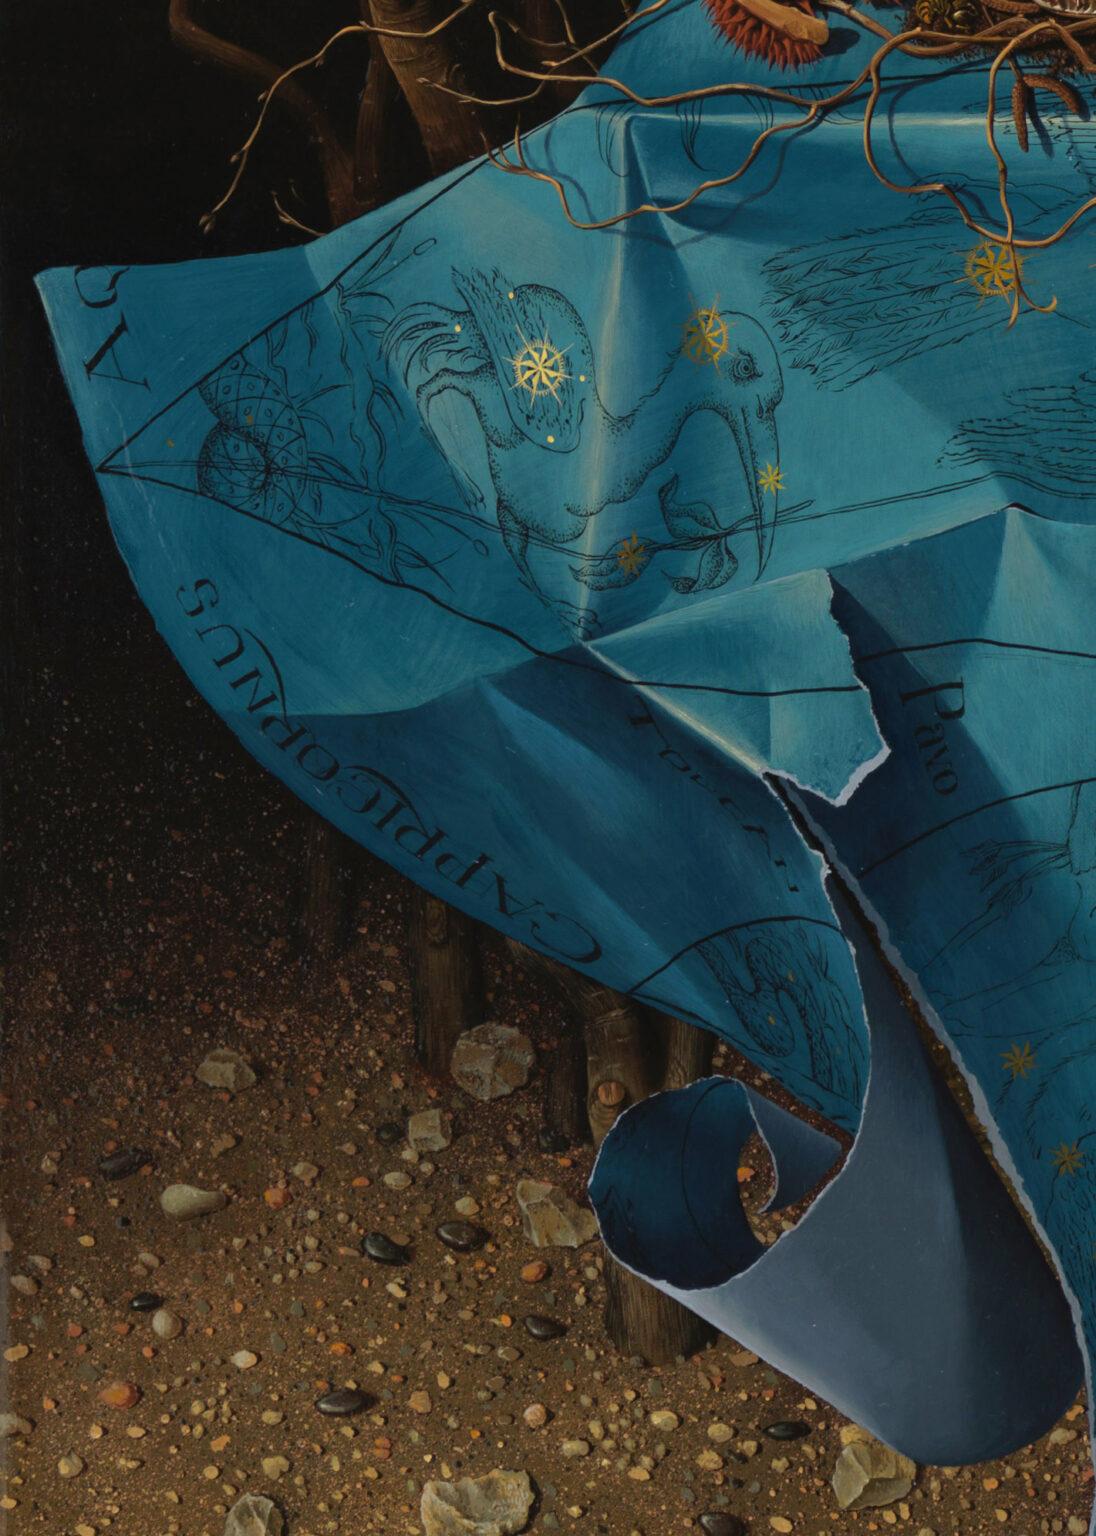 THE-HEAVENS-giclee-print-detail 5-Miriam-Escofet